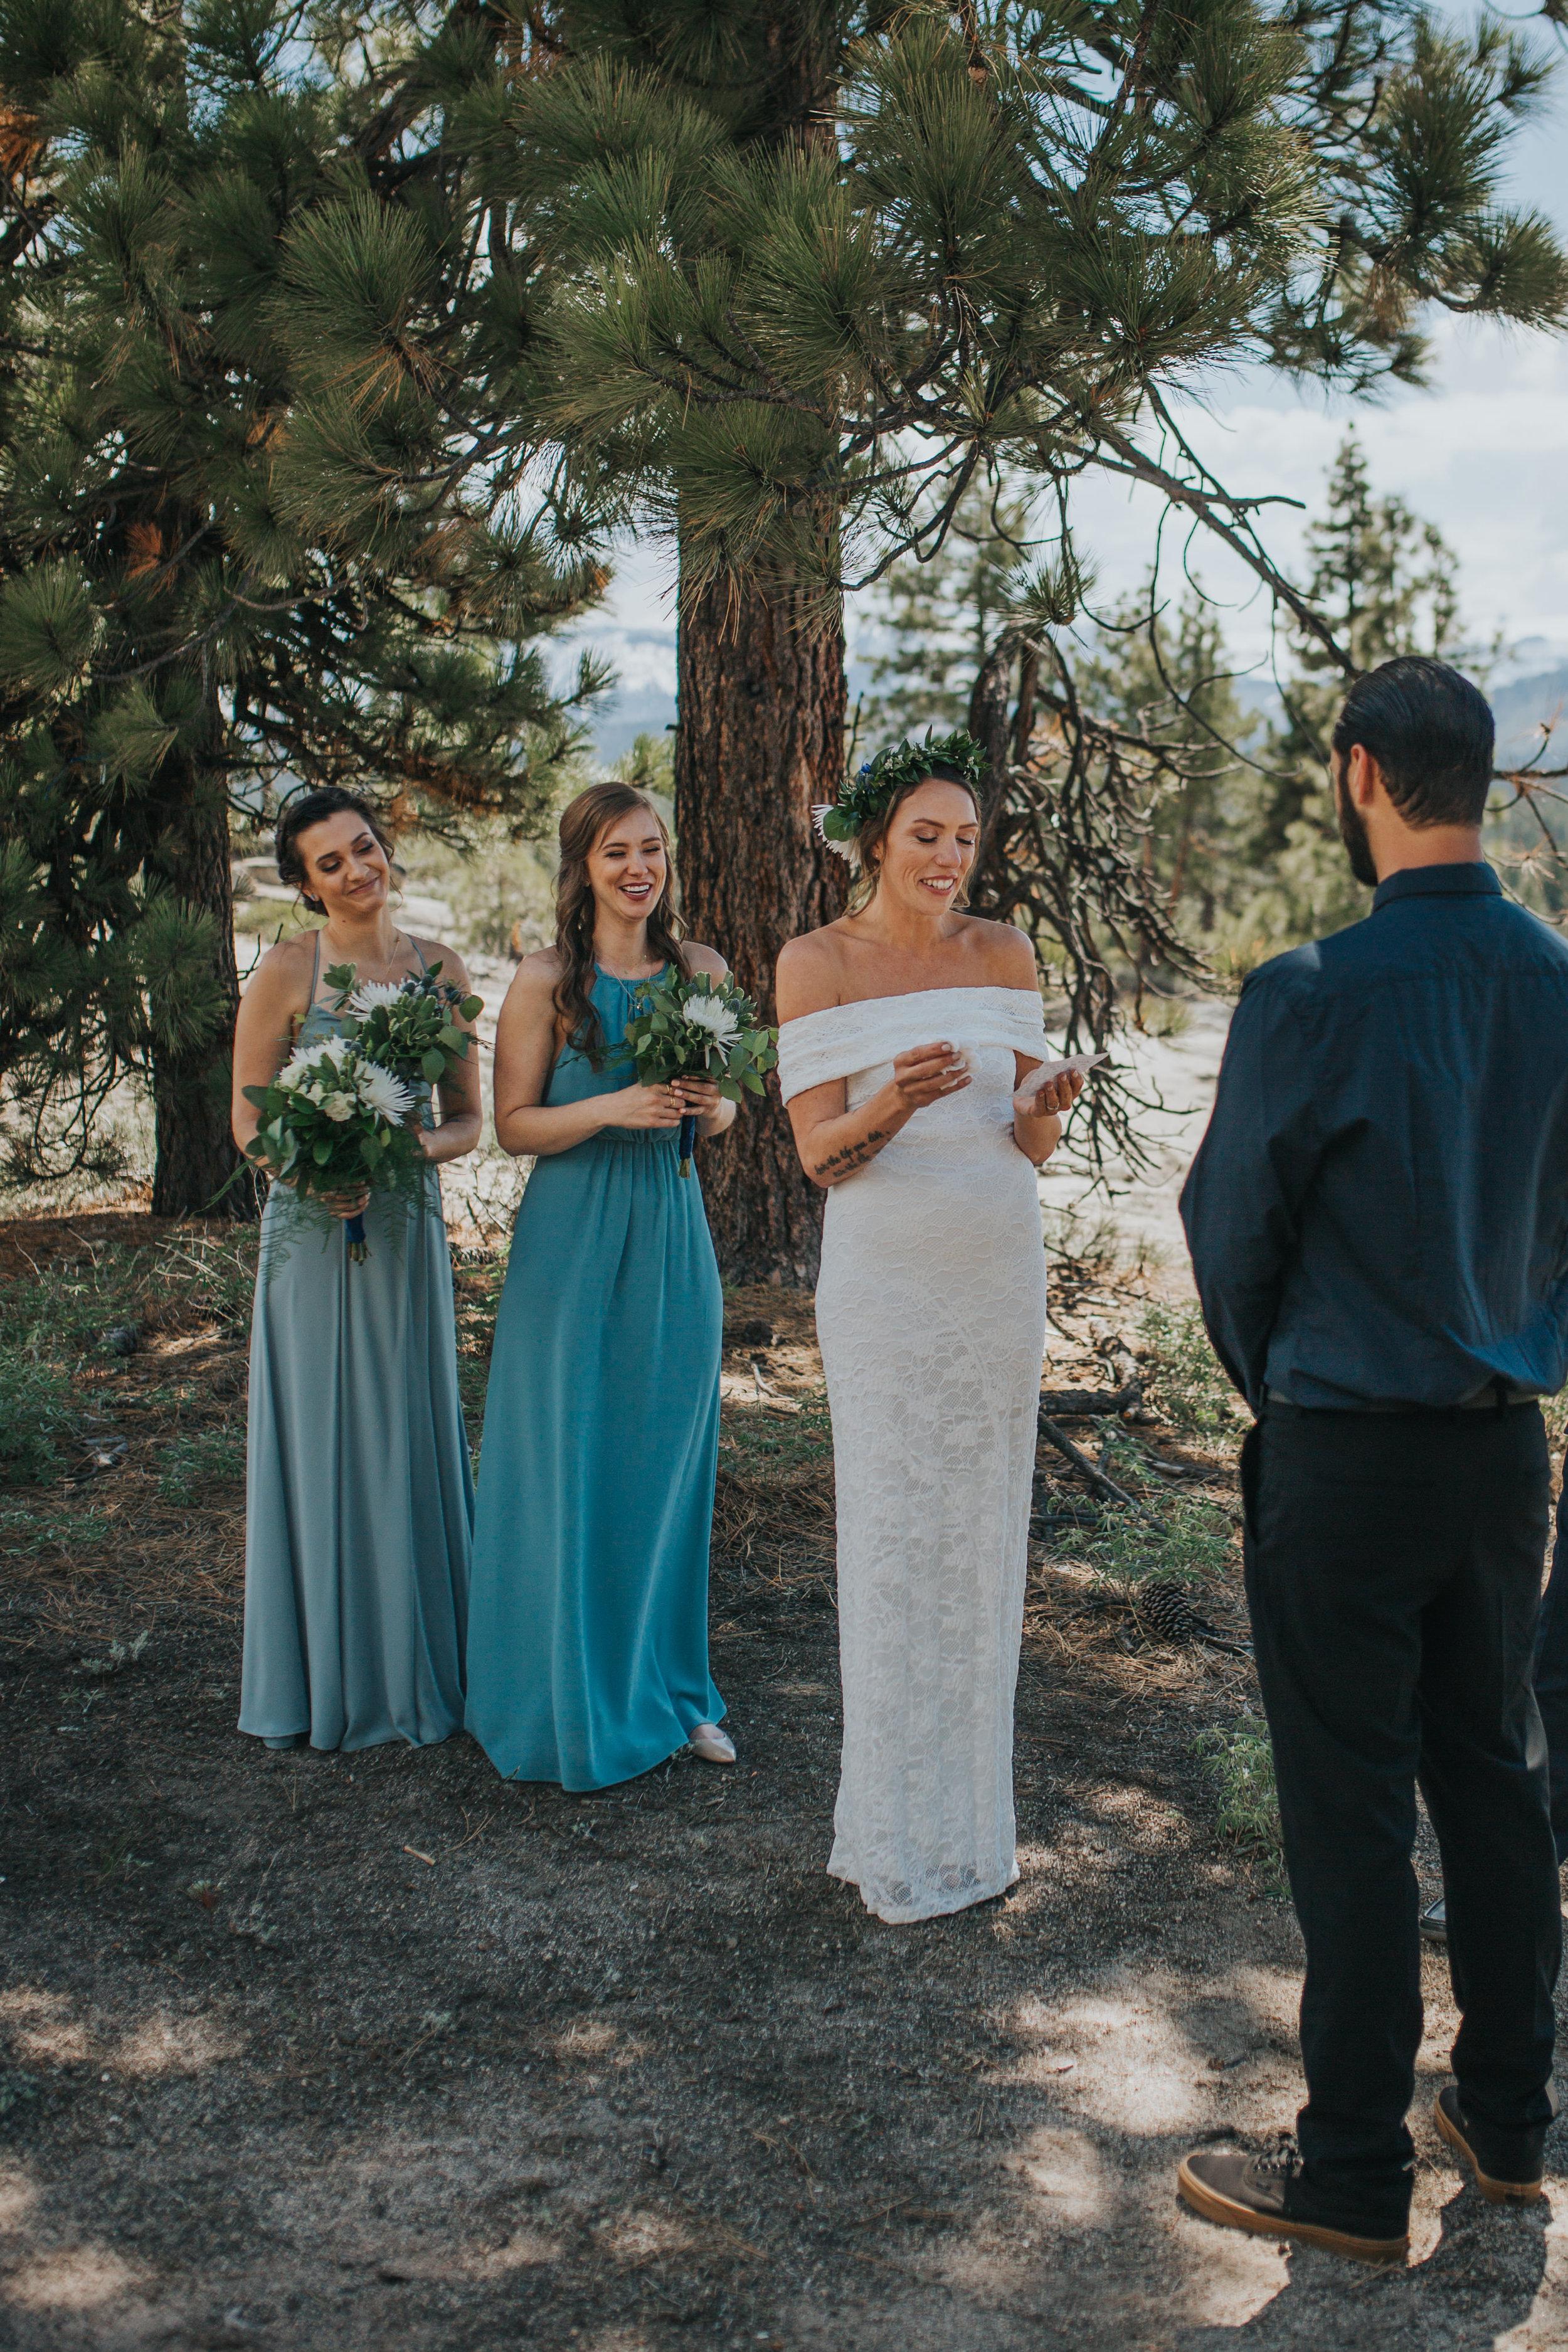 south-lake-tahoe-elopement-valerie-lendvay-photo-028.jpg